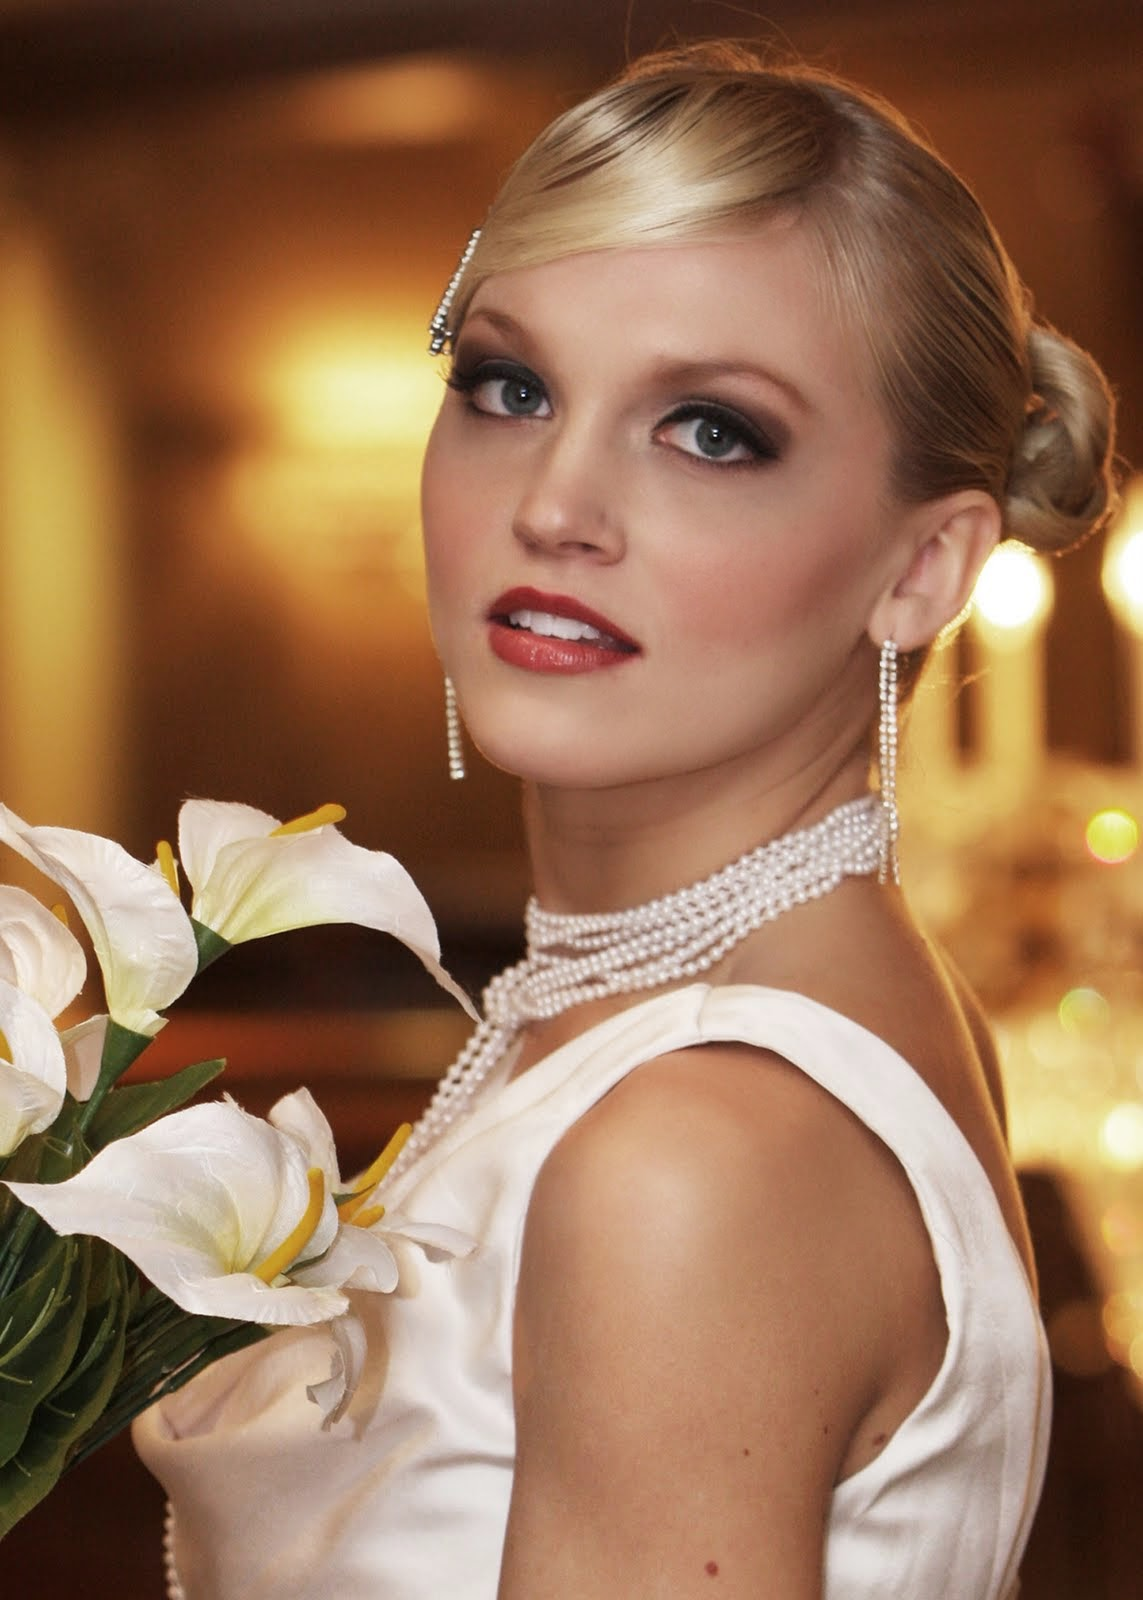 Inspiration Make Up pour mon Mariage   Tout pour mon mariage